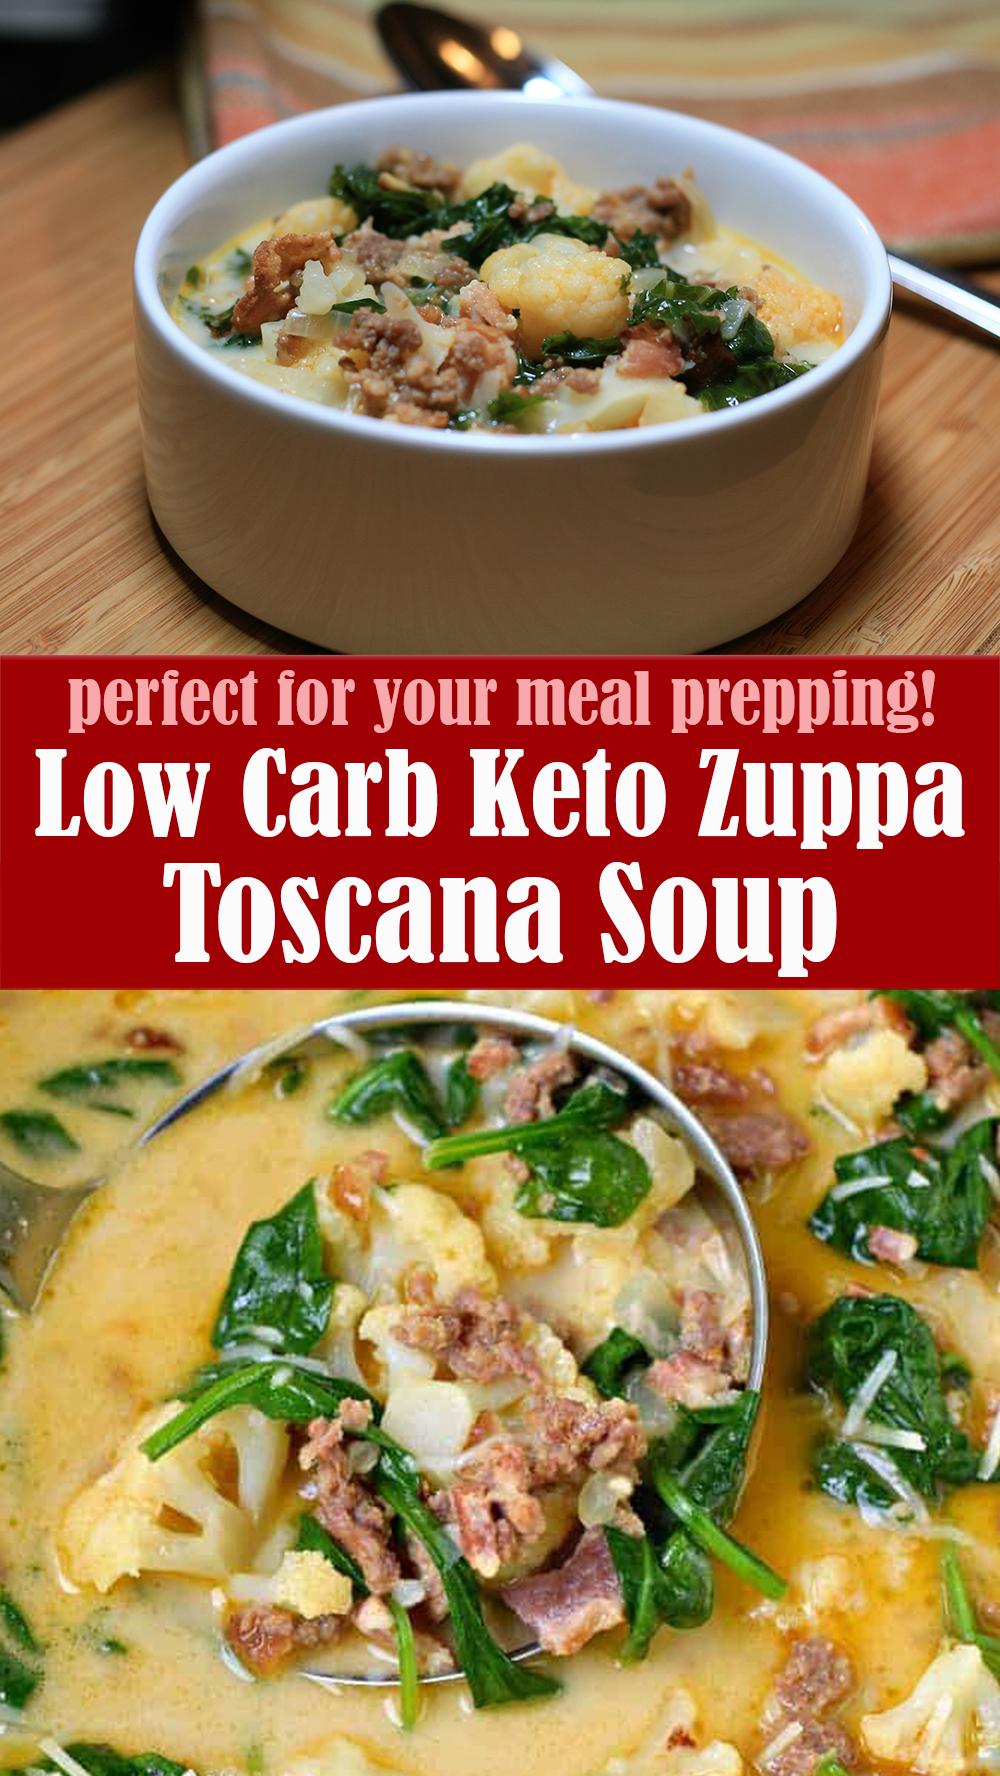 Easy Low Carb Keto Zuppa Toscana Soup Recipe